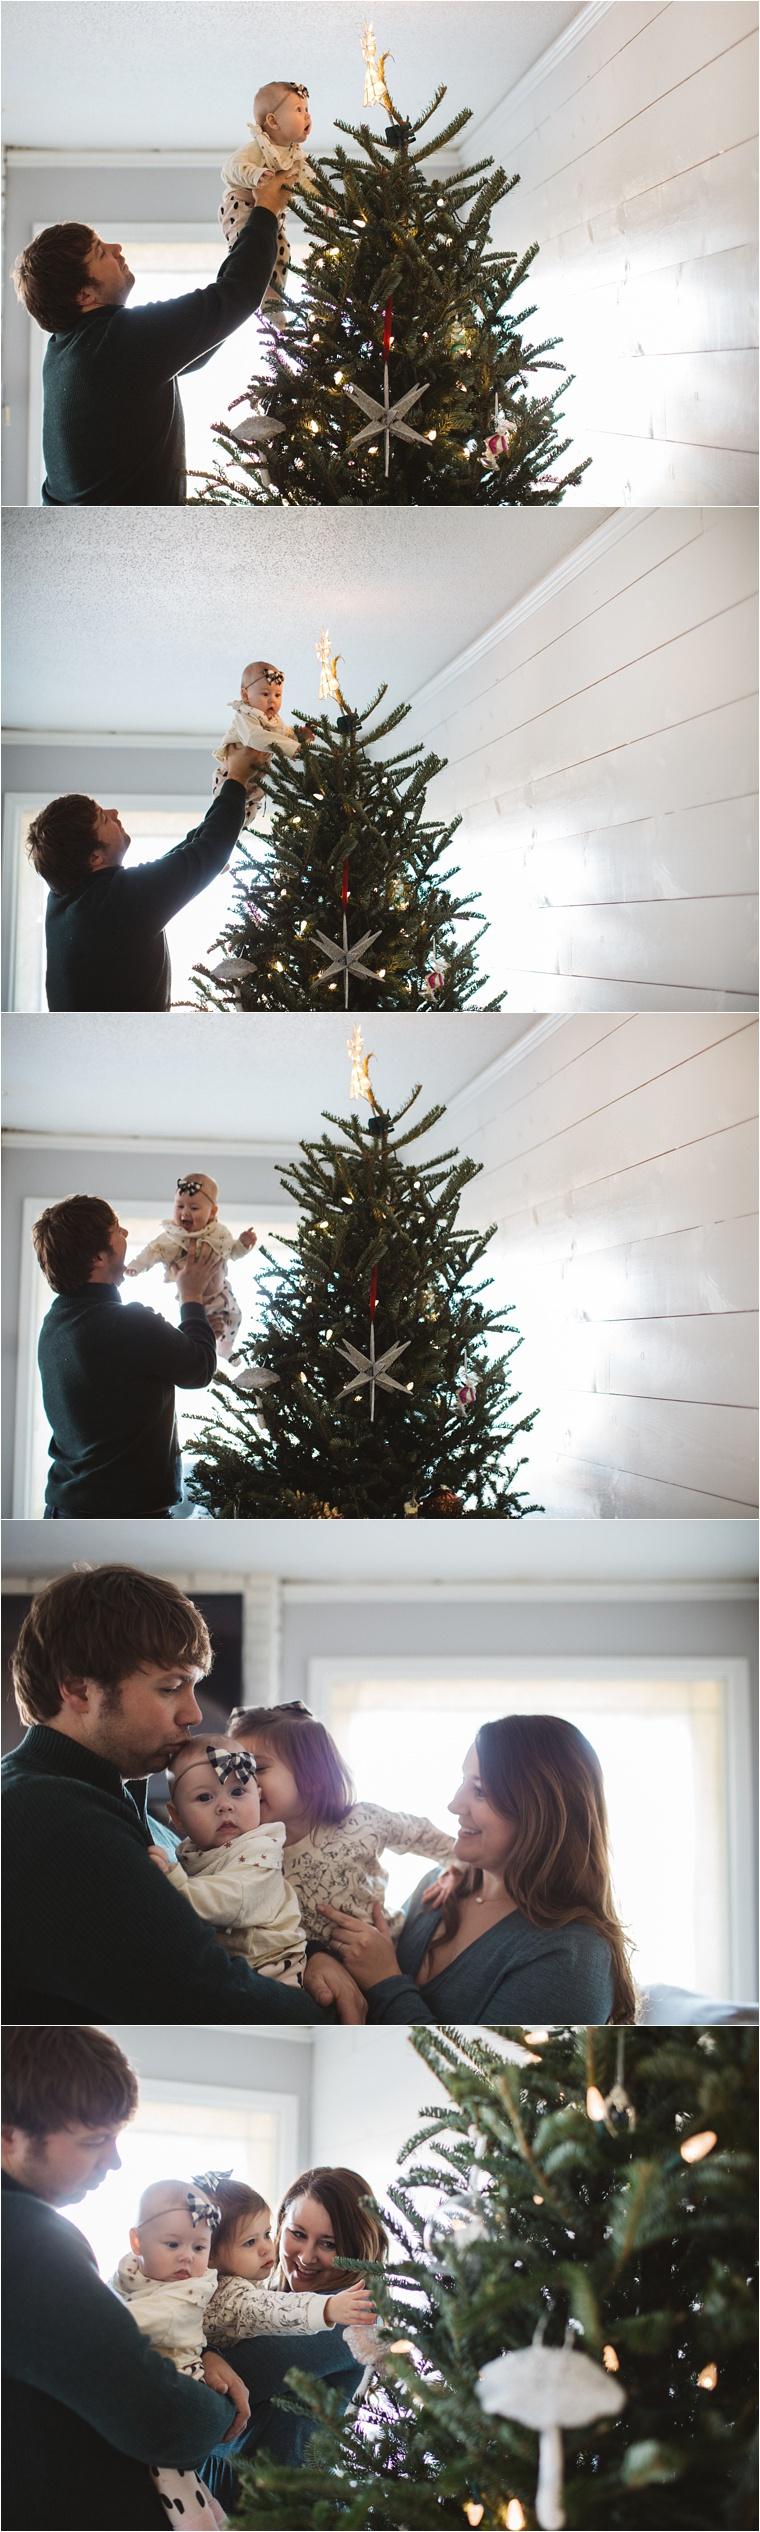 kansascityfamilyphotographer_0223